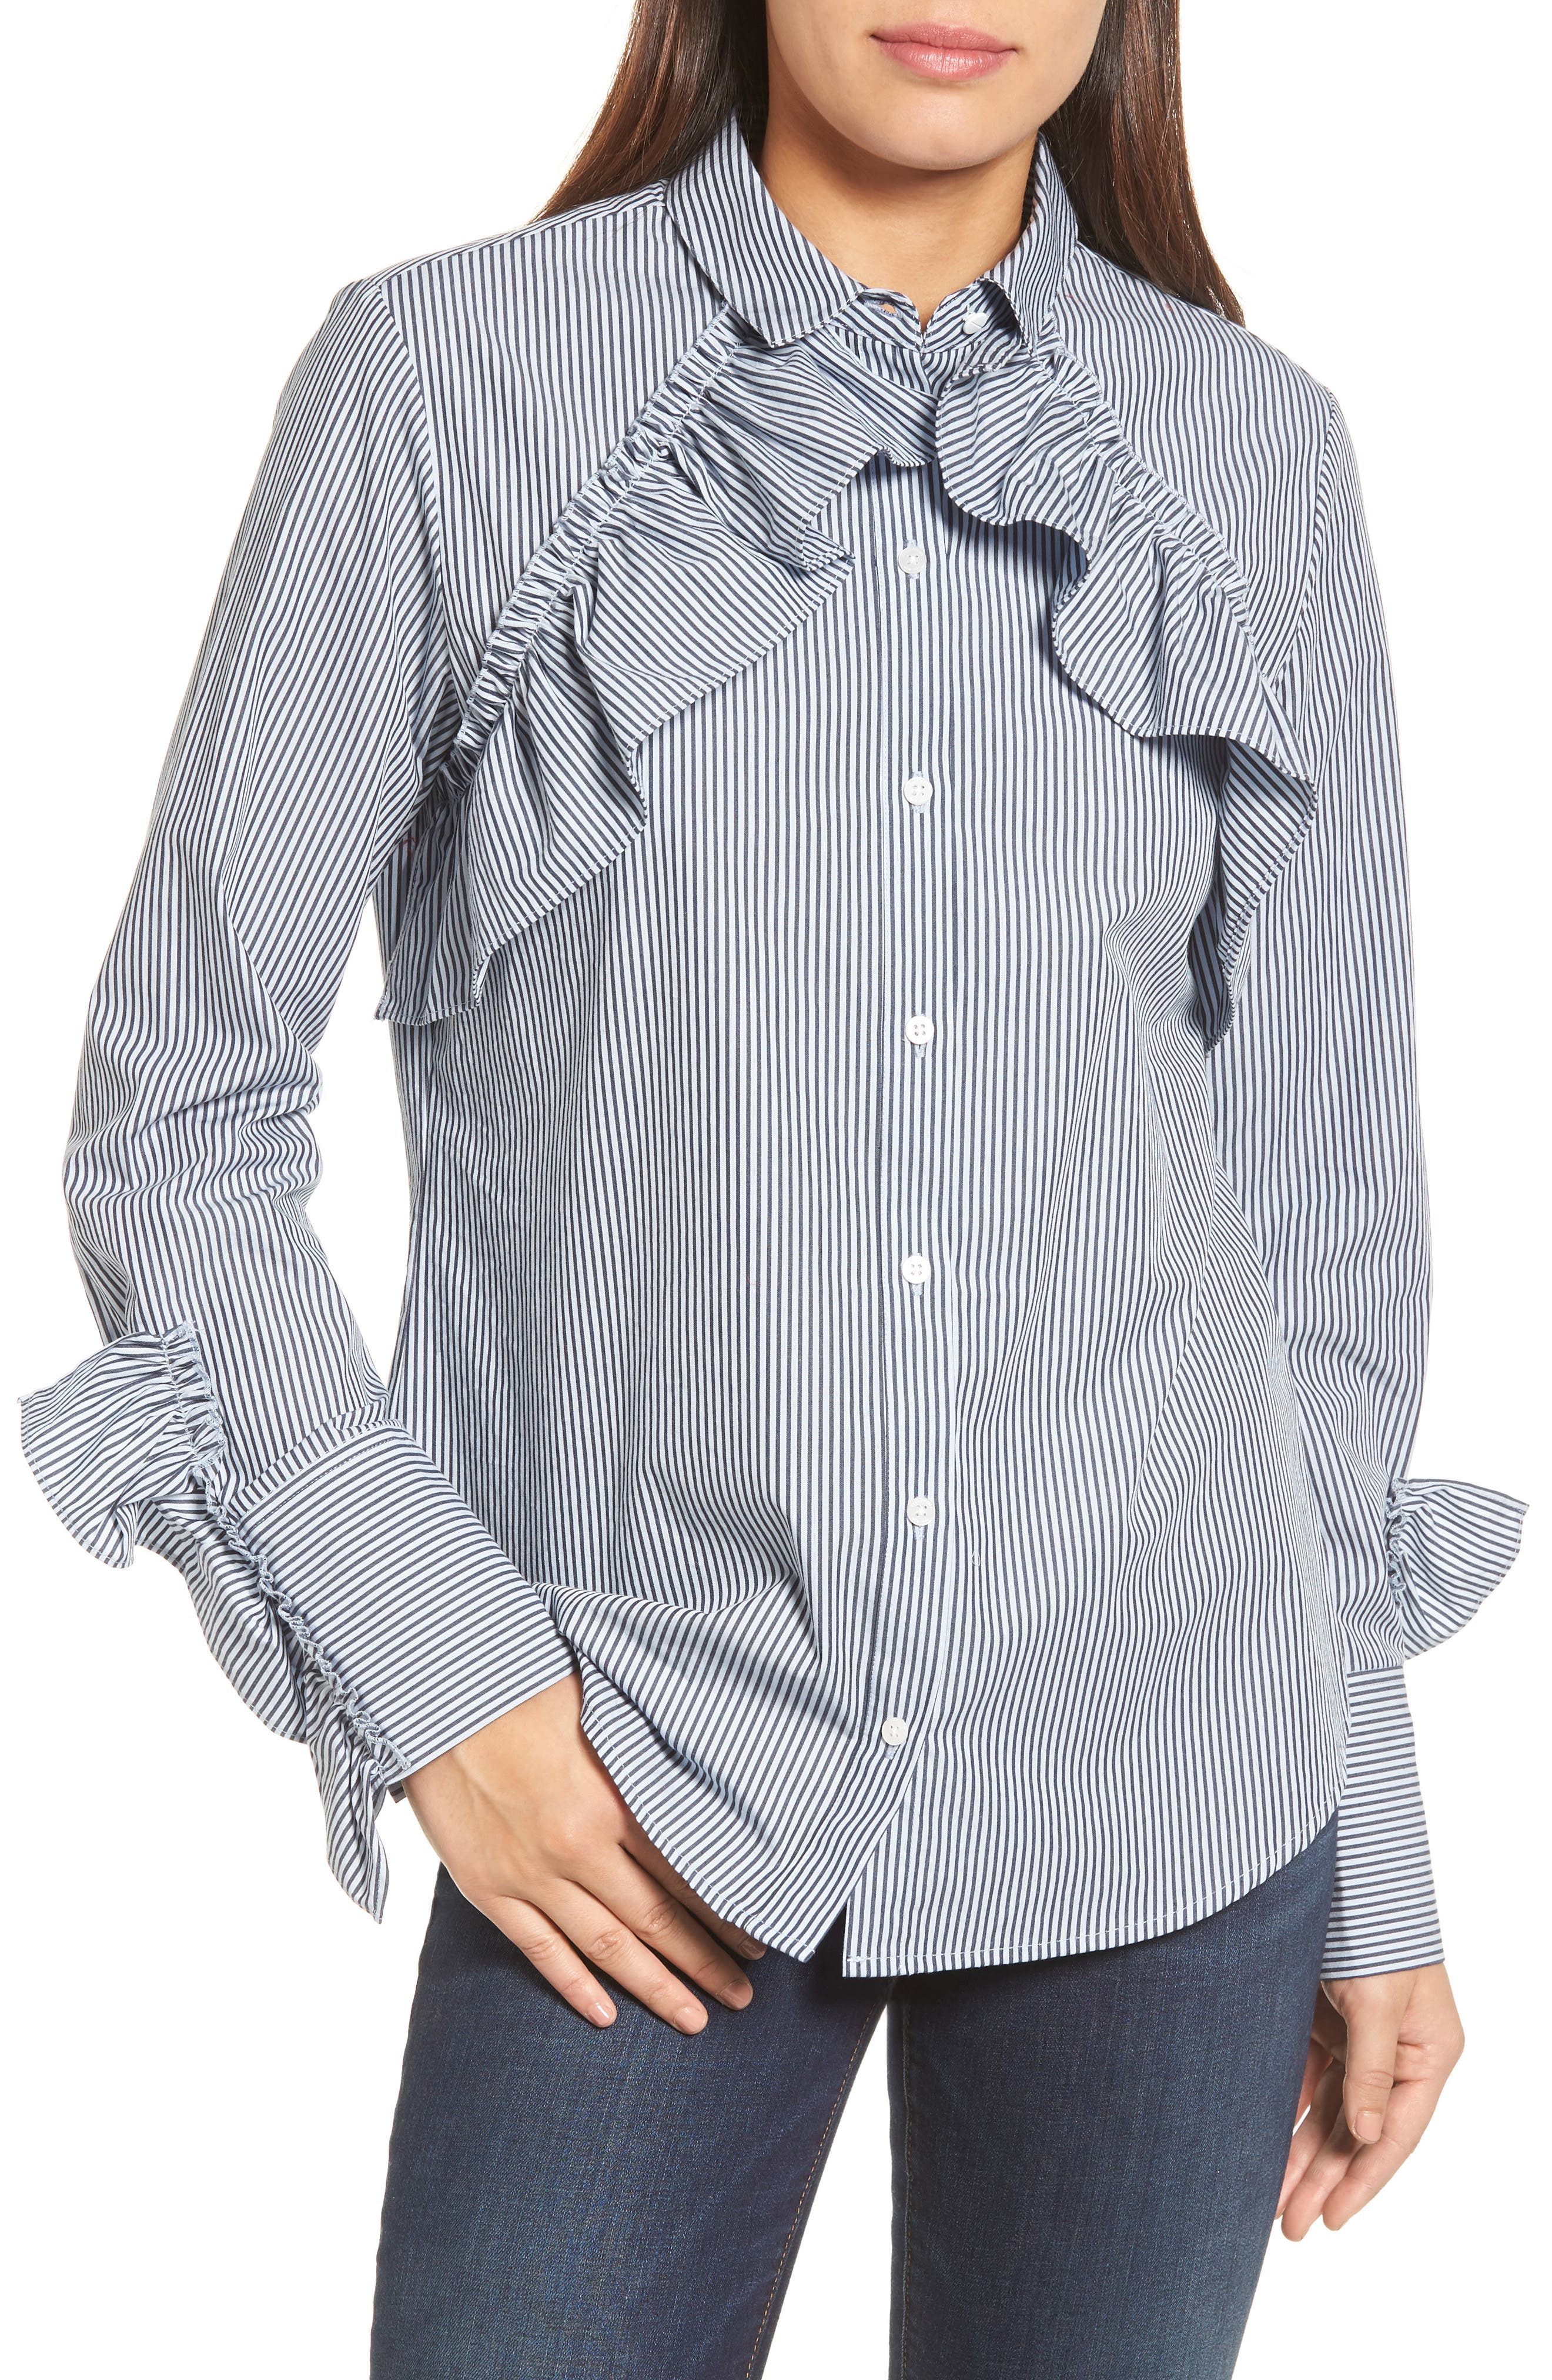 Ruffle Poplin Shirt,                             Main thumbnail 1, color,                             460